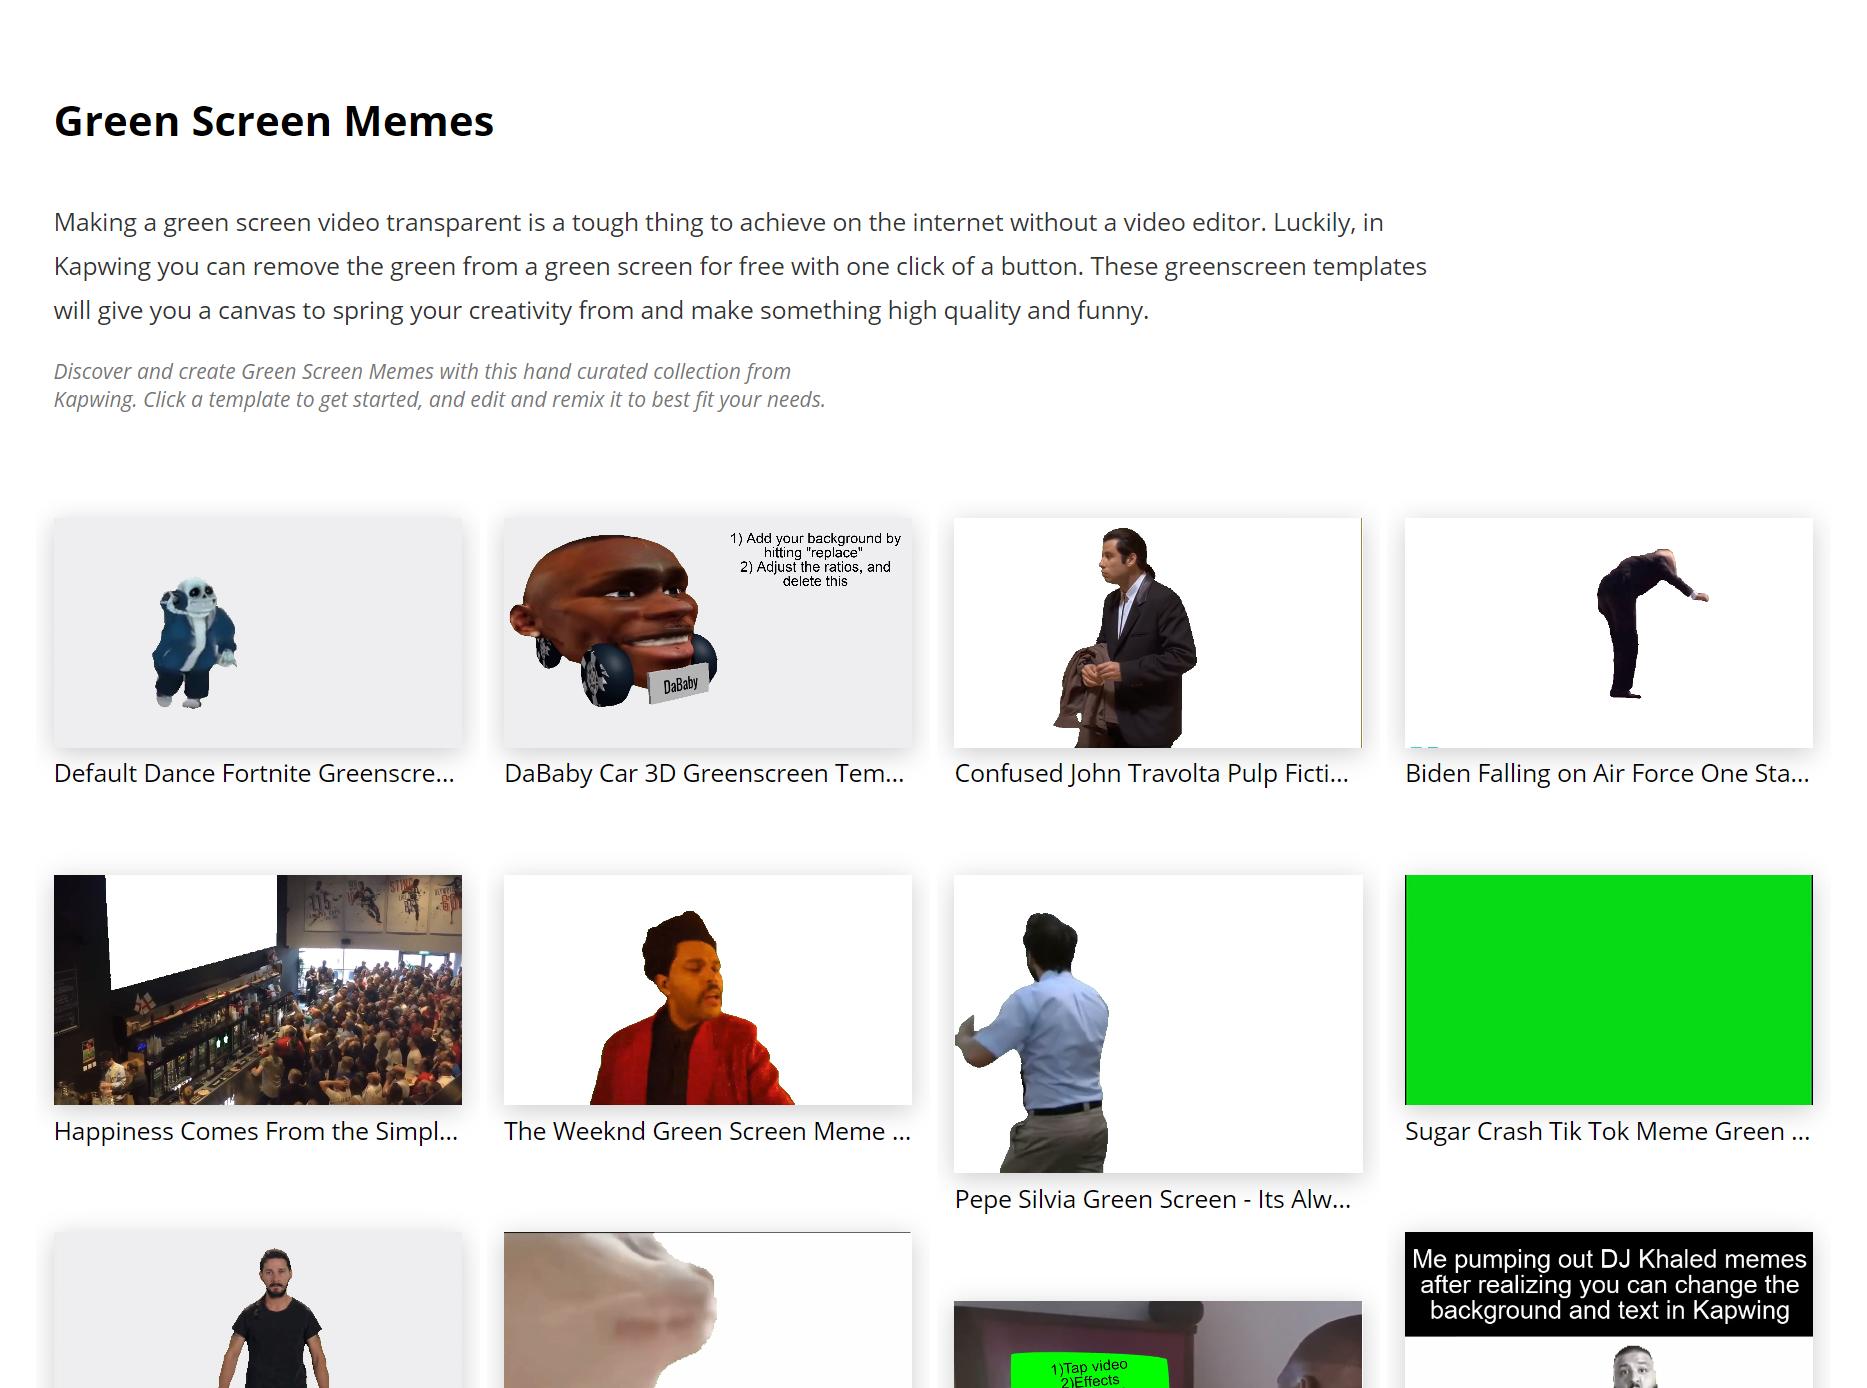 Kapwing's Green Screen Meme Collection